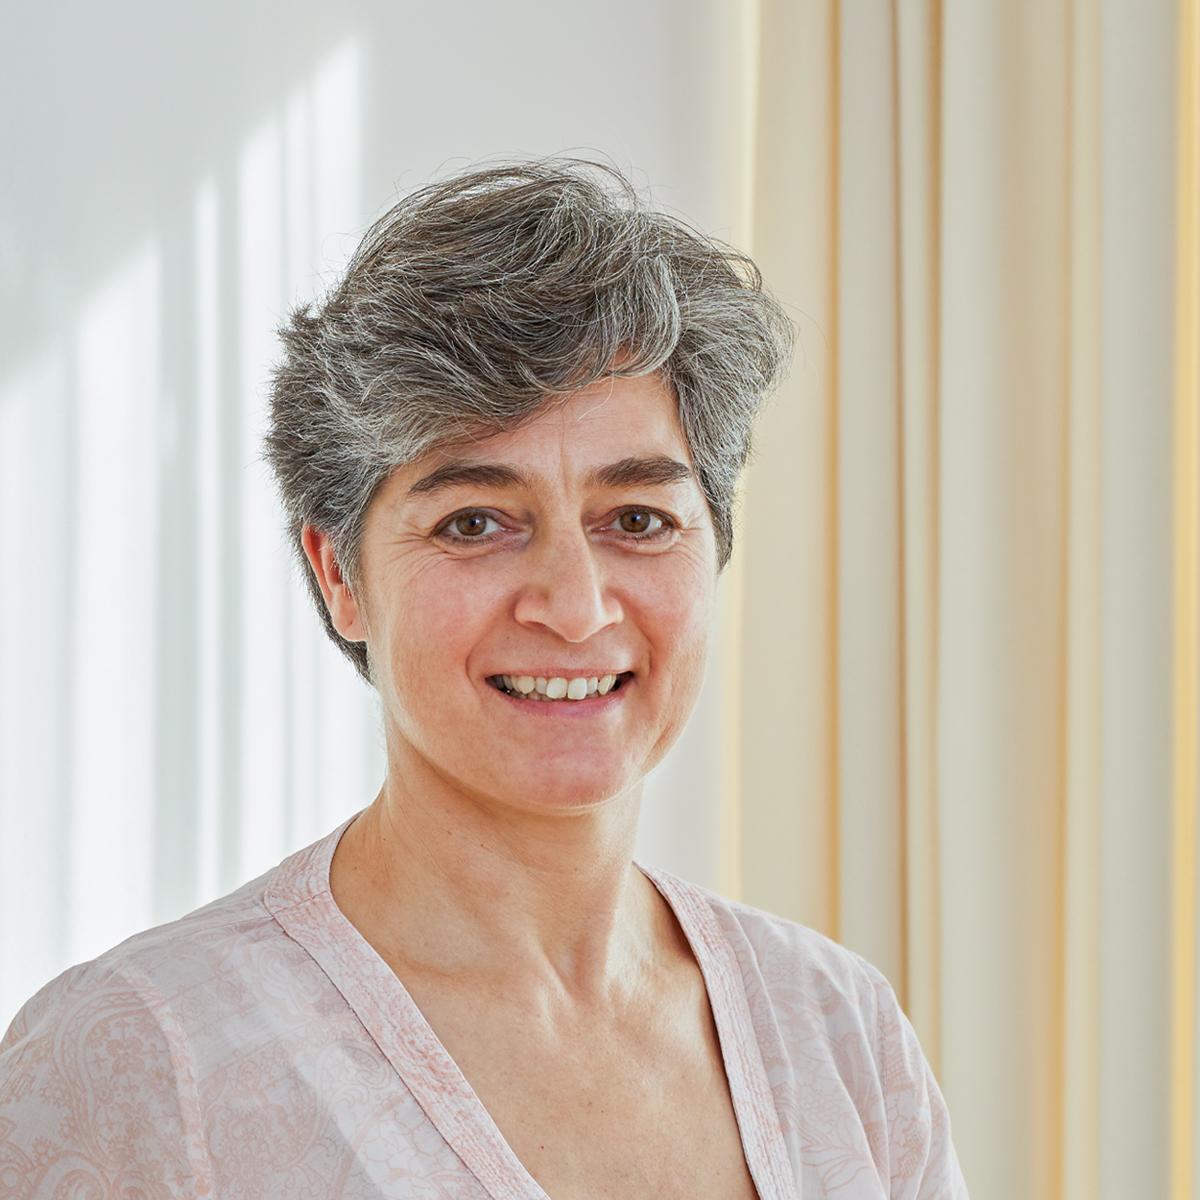 Wilma Kreissig